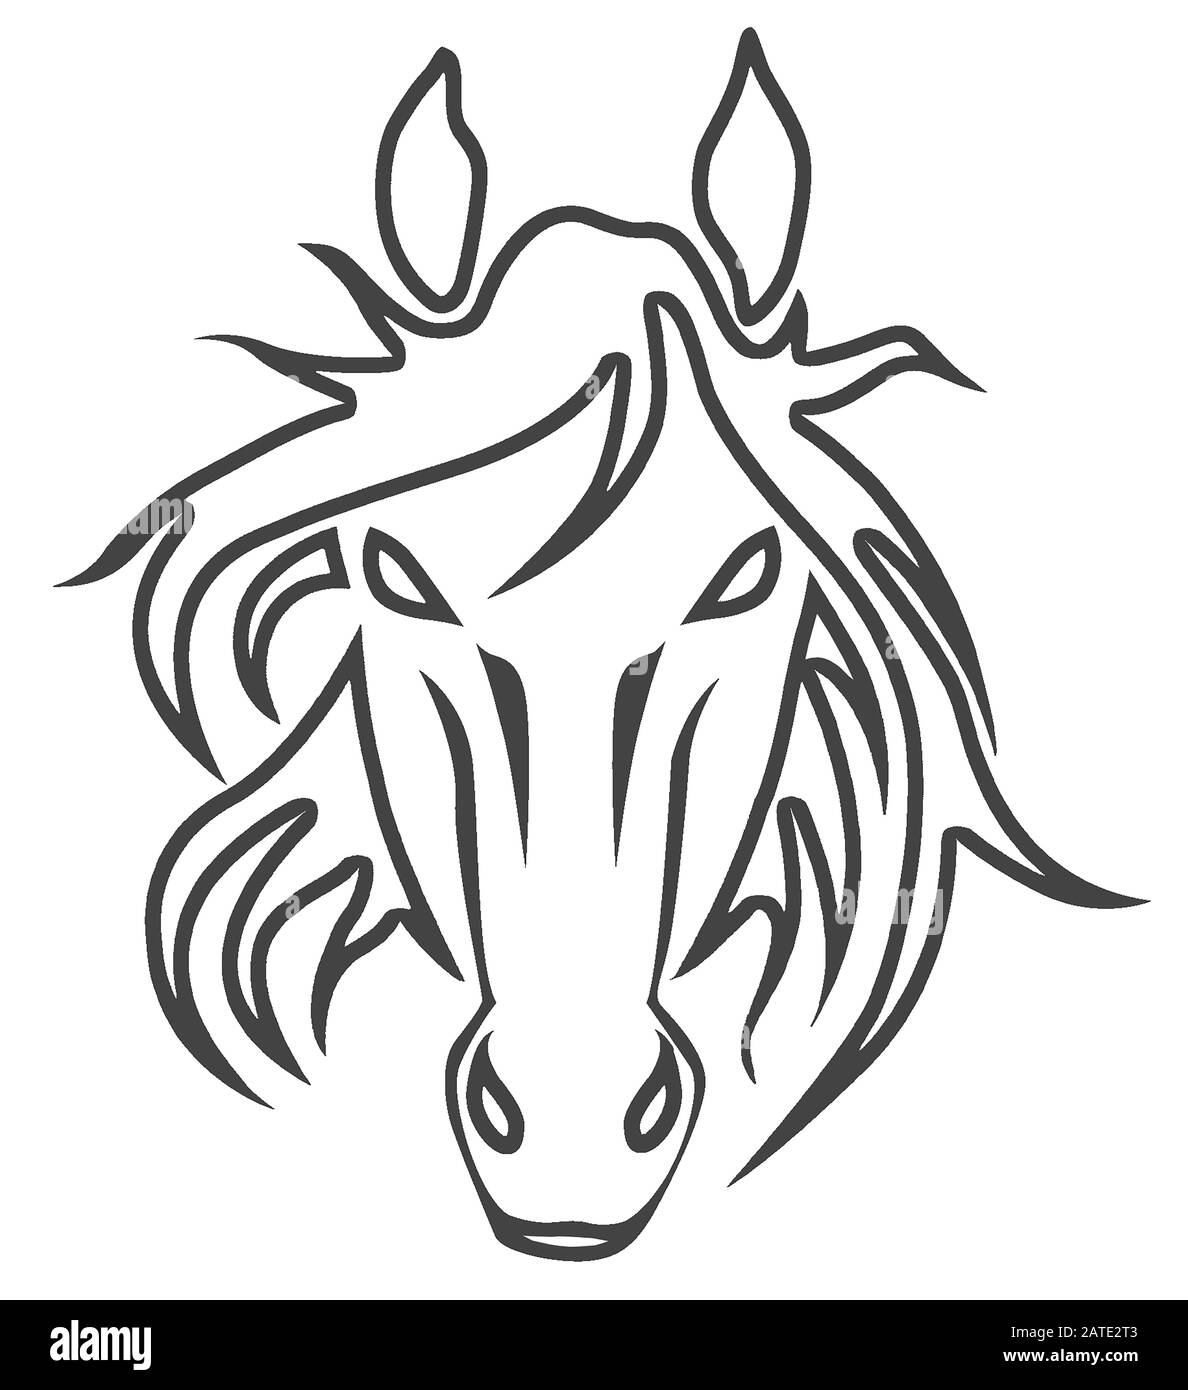 Horse Logo Illustration Realistic Drawing Design Stock Photo Alamy